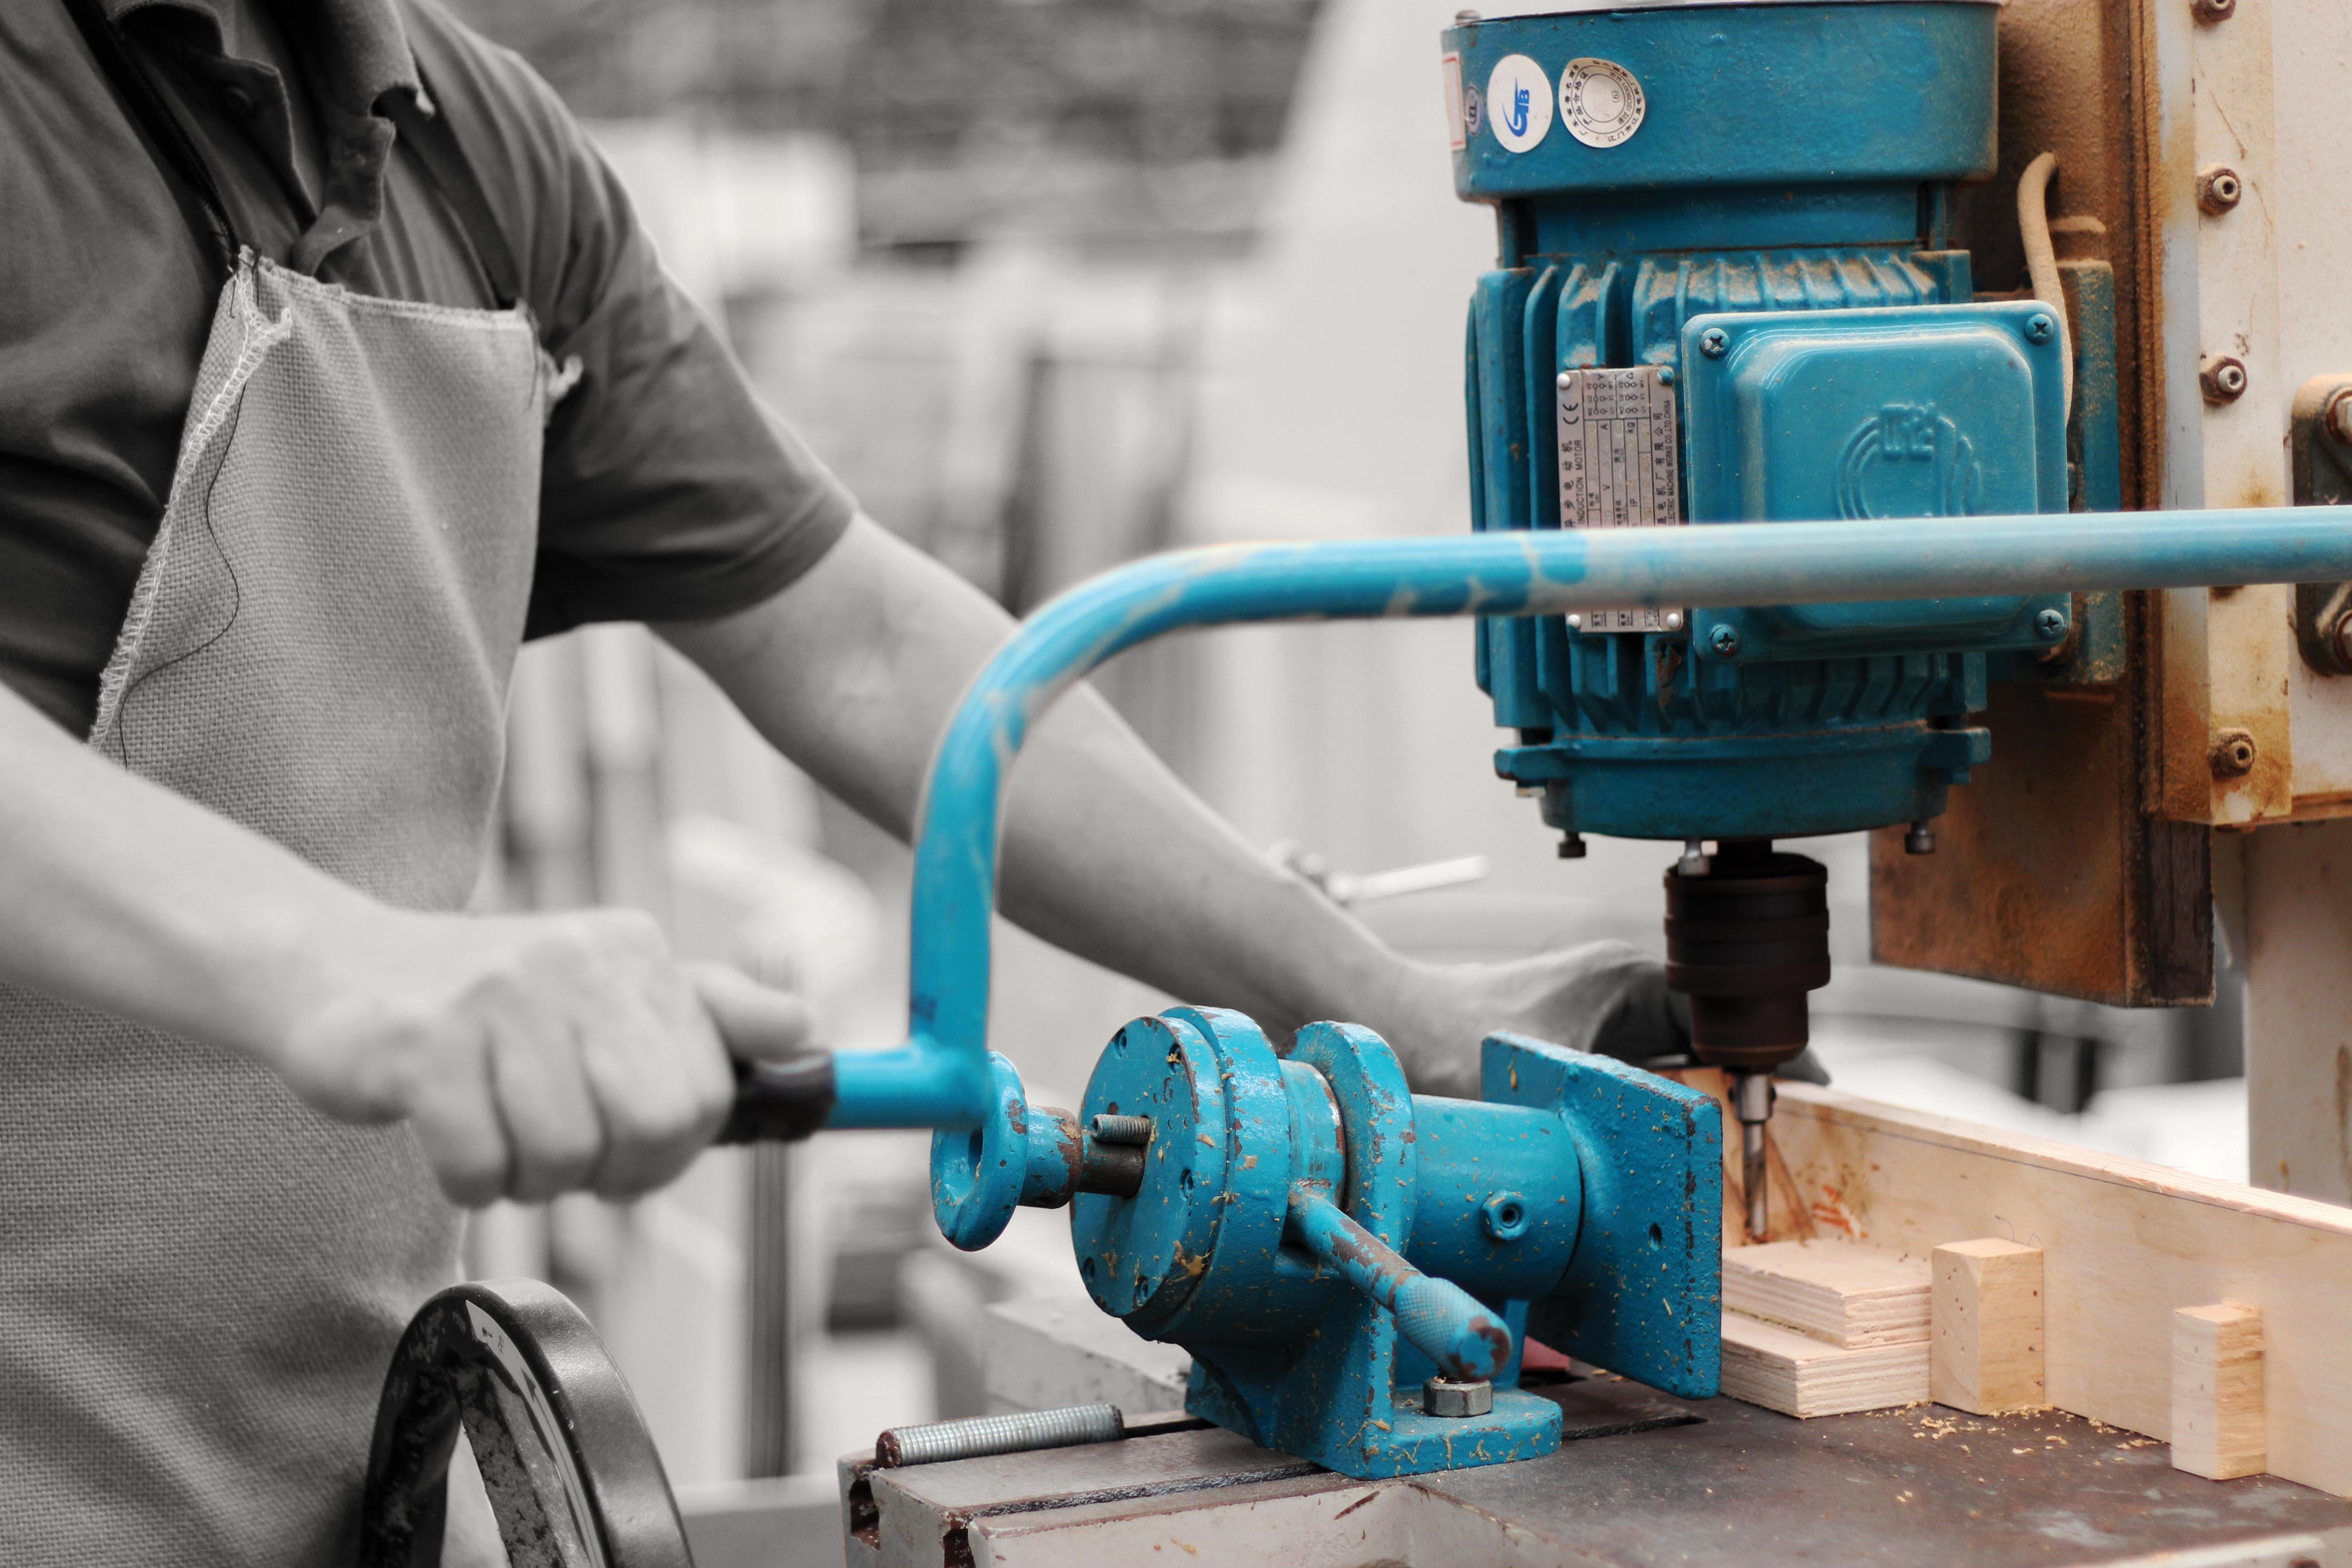 manufacturingcapabilities-woodwork1.jpg